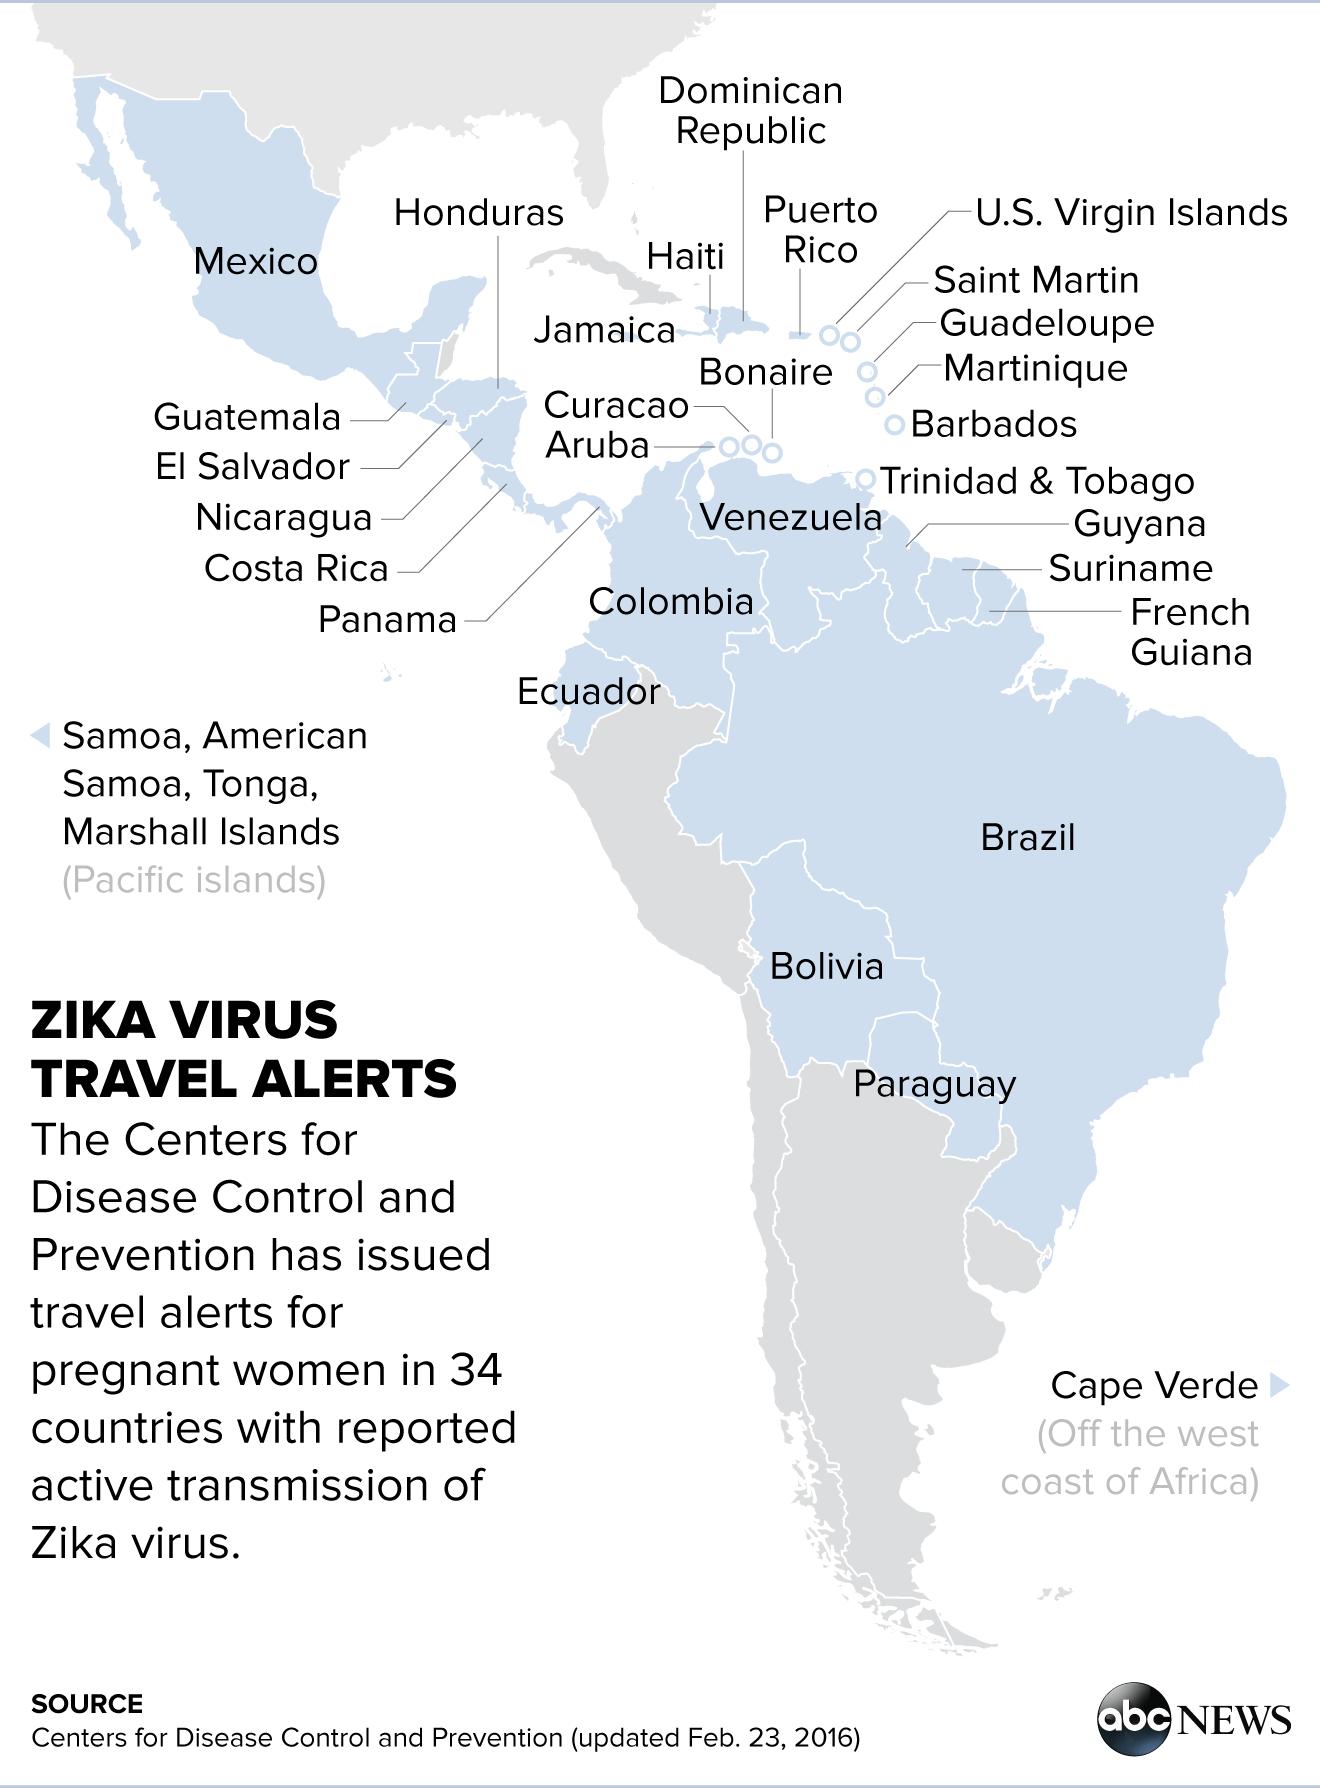 CDC Investigating Reports Of Sexually Transmitted Zika Virus In - Zika virus map us